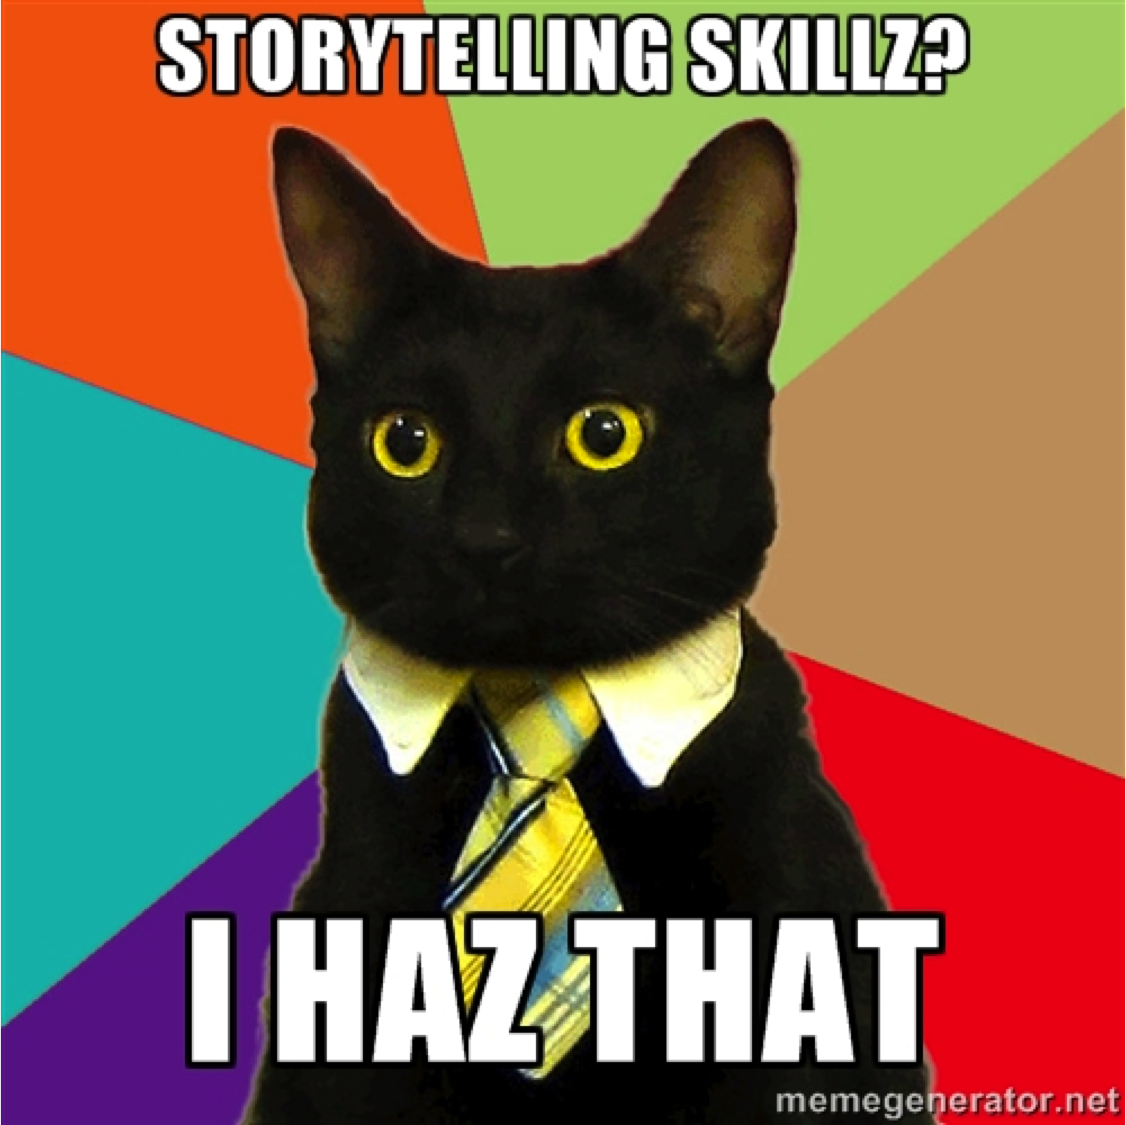 StorytellingSkills.png